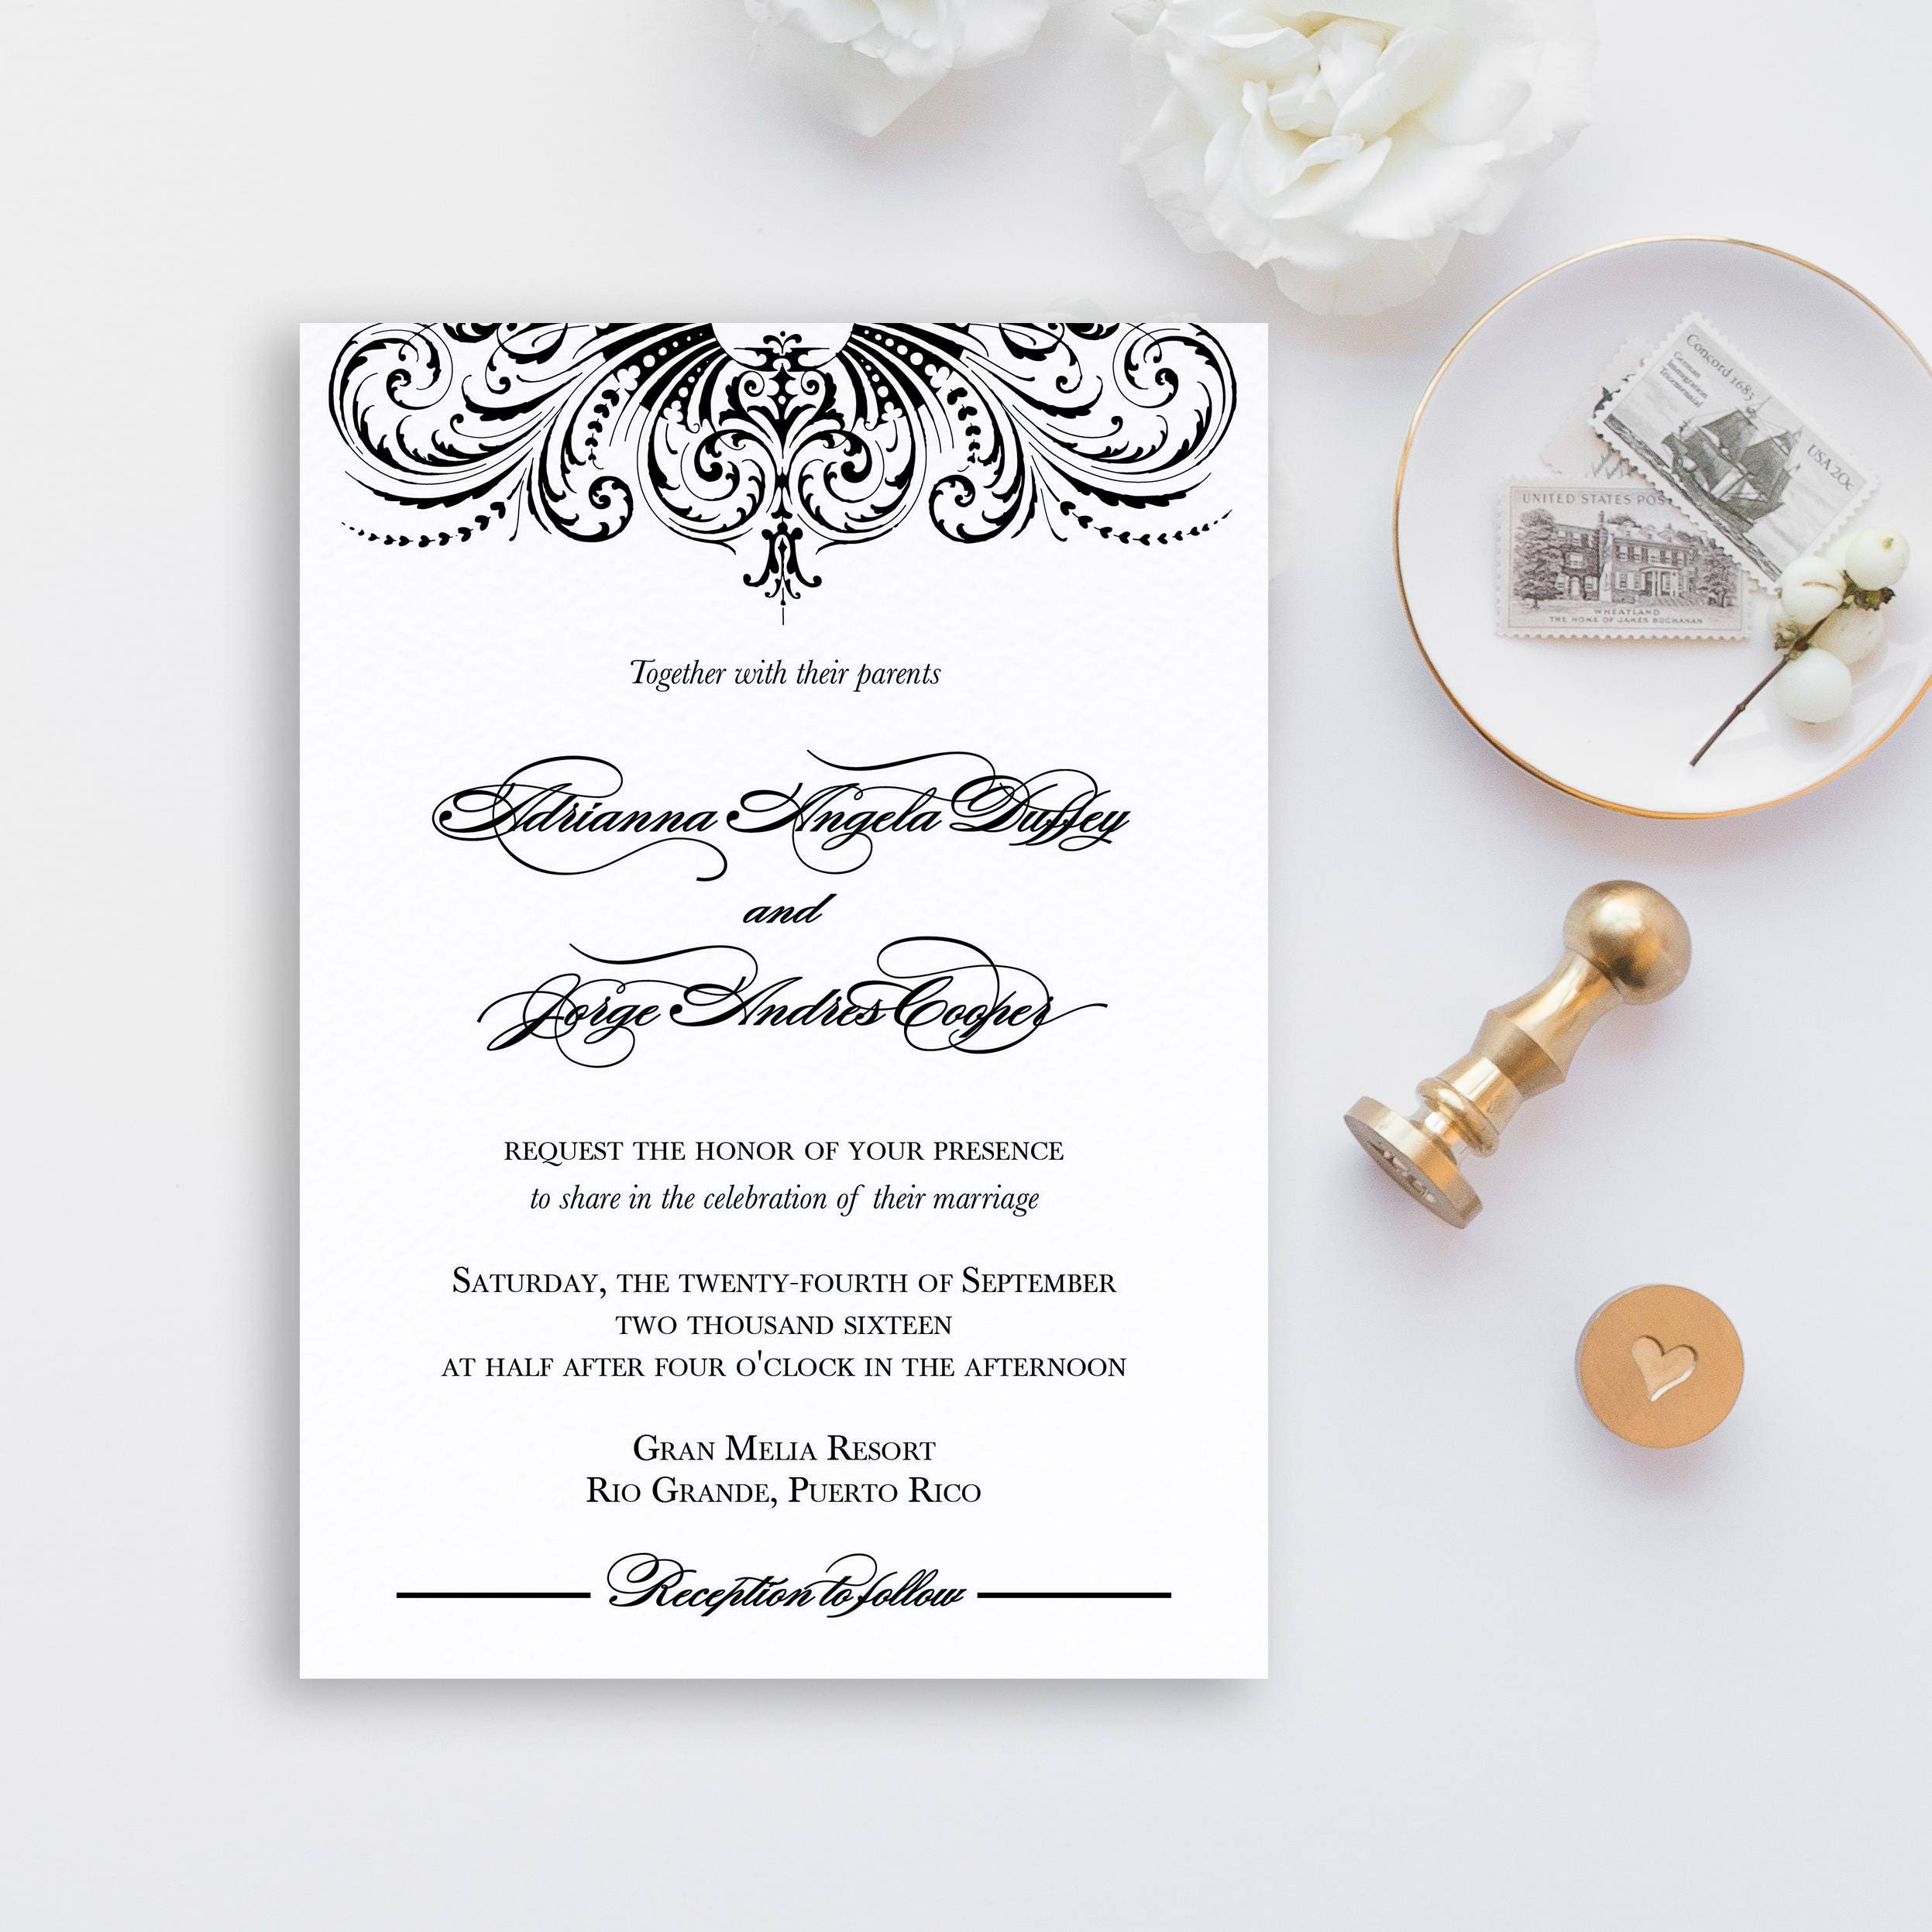 Great Gatsby Wedding Invites: Great Gatsby Wedding Invitation Old Hollywood Wedding